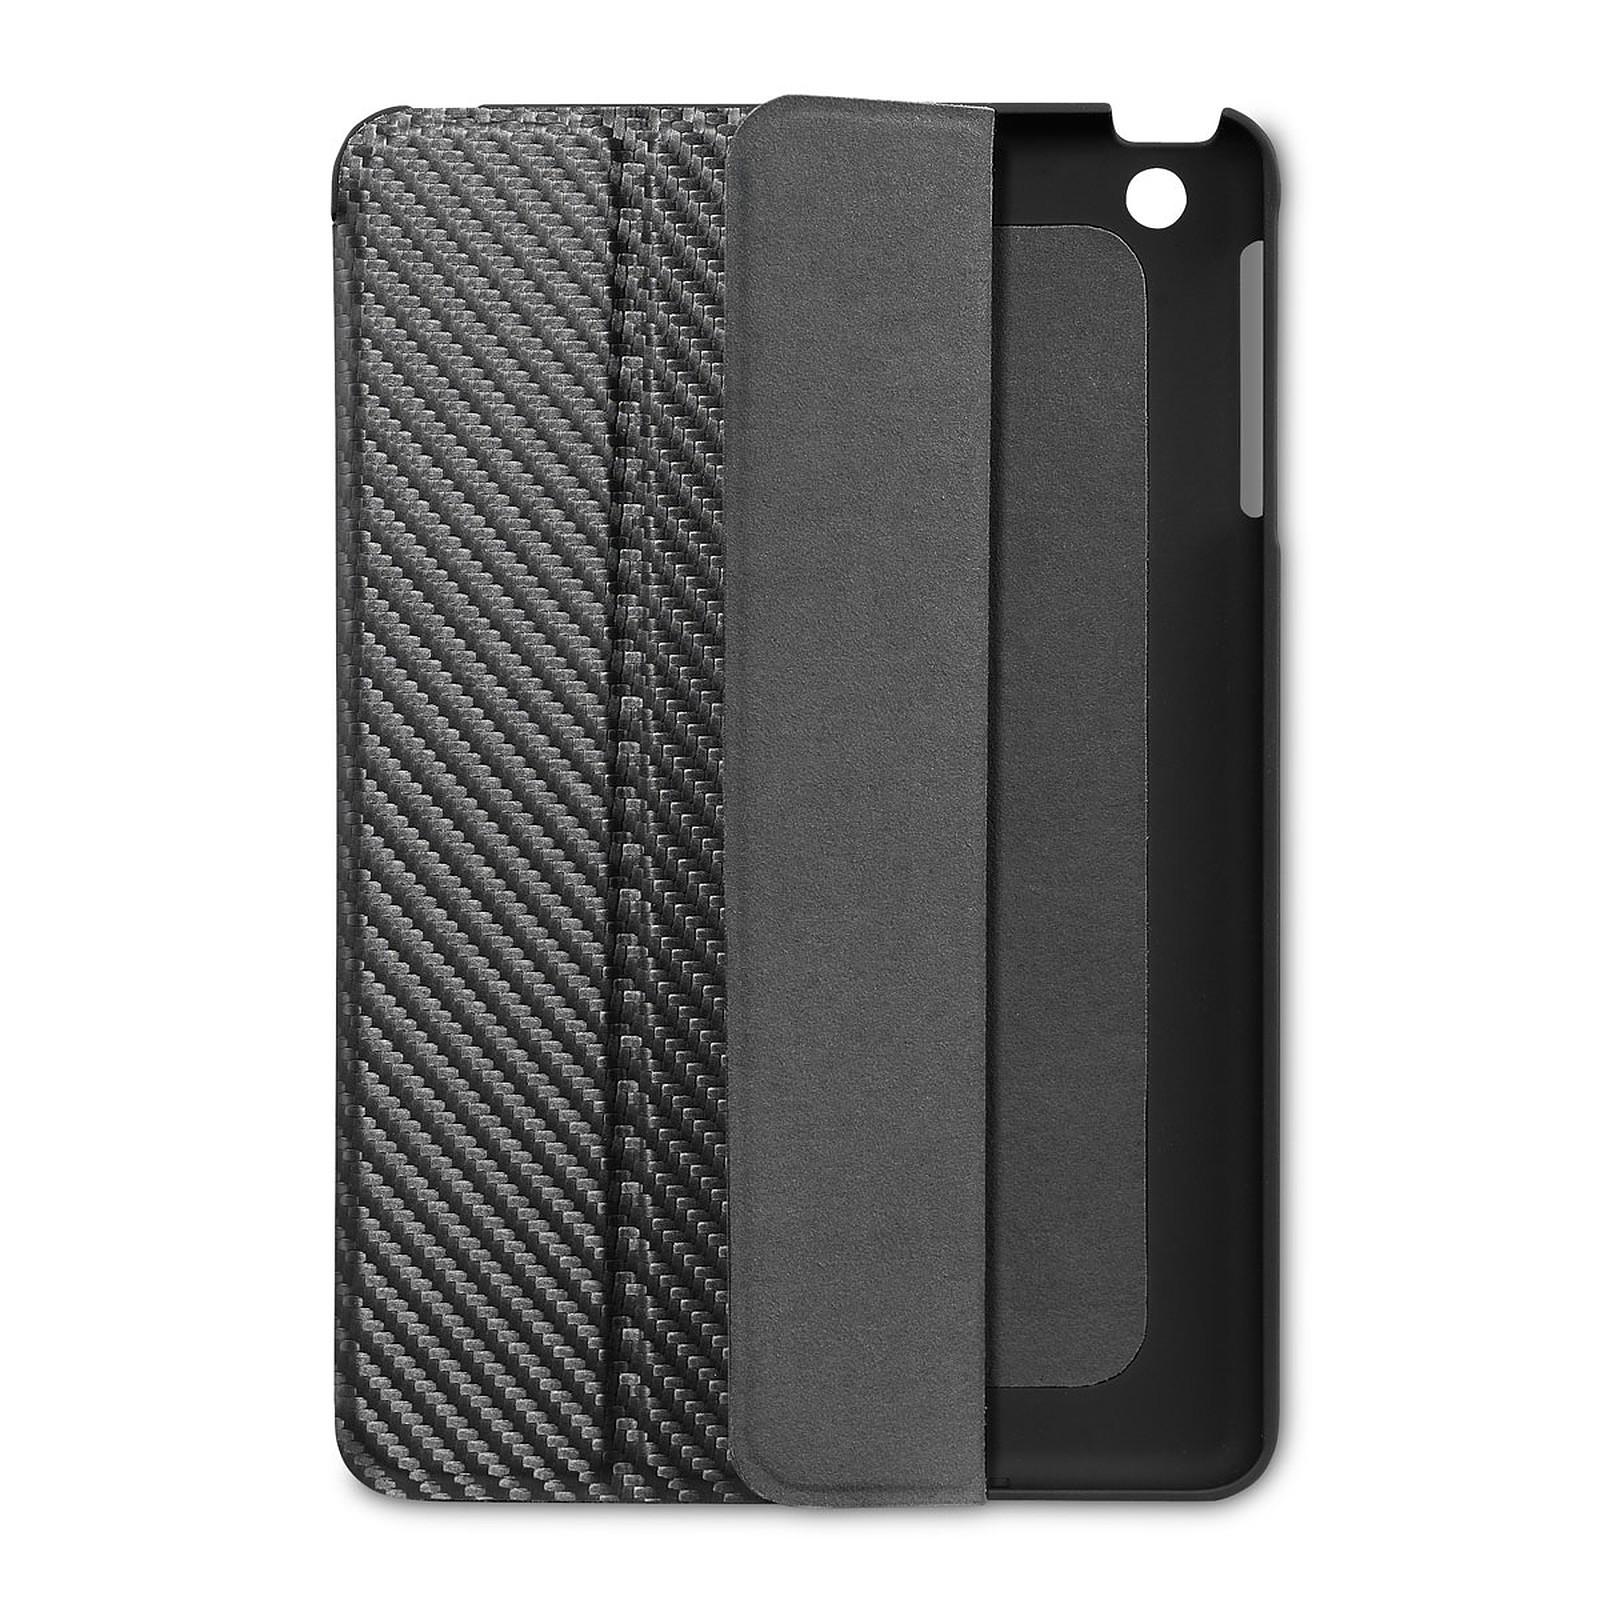 Cooler Master Wake Up Folio Carbon Texture Midnight Black for iPad mini